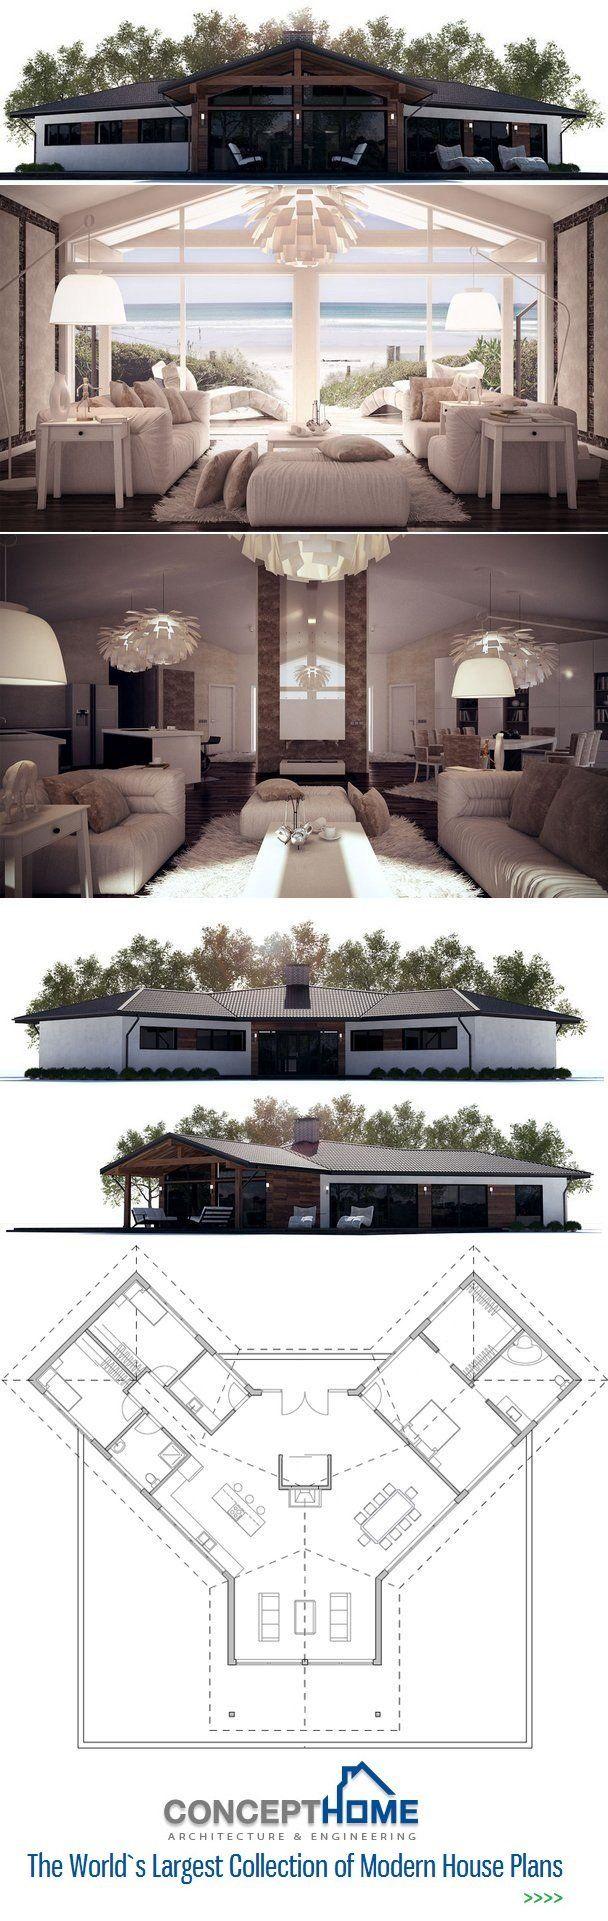 Planos de la casa. Planta de ConceptHome.com